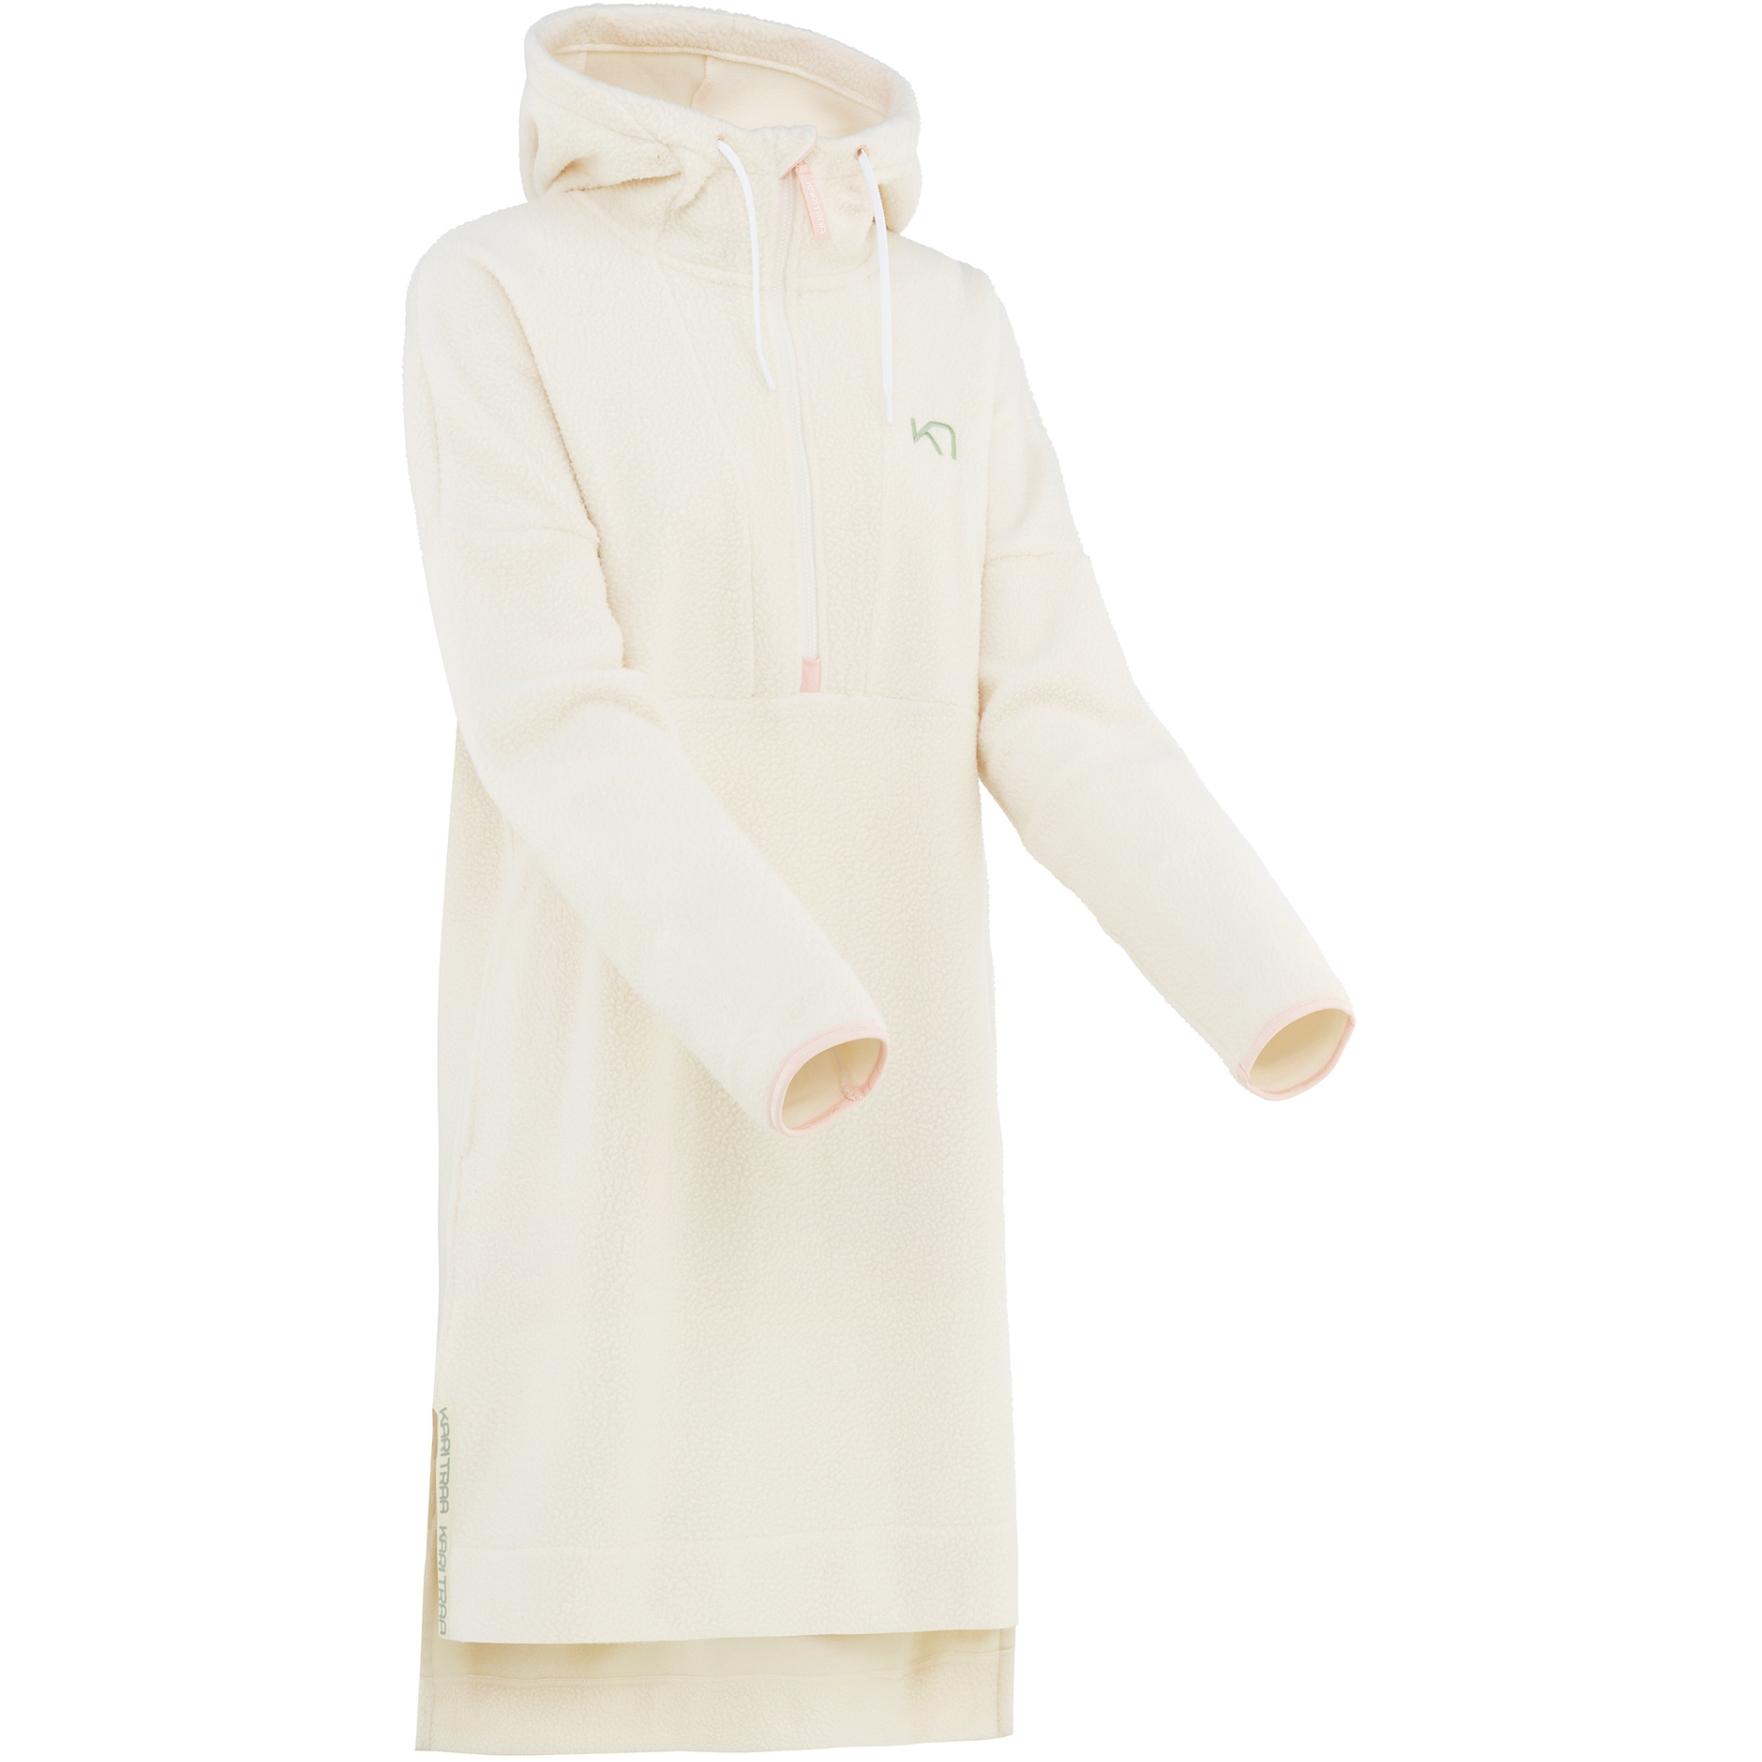 Kari Traa Astrid Women's Hoody Dress - Nwhite